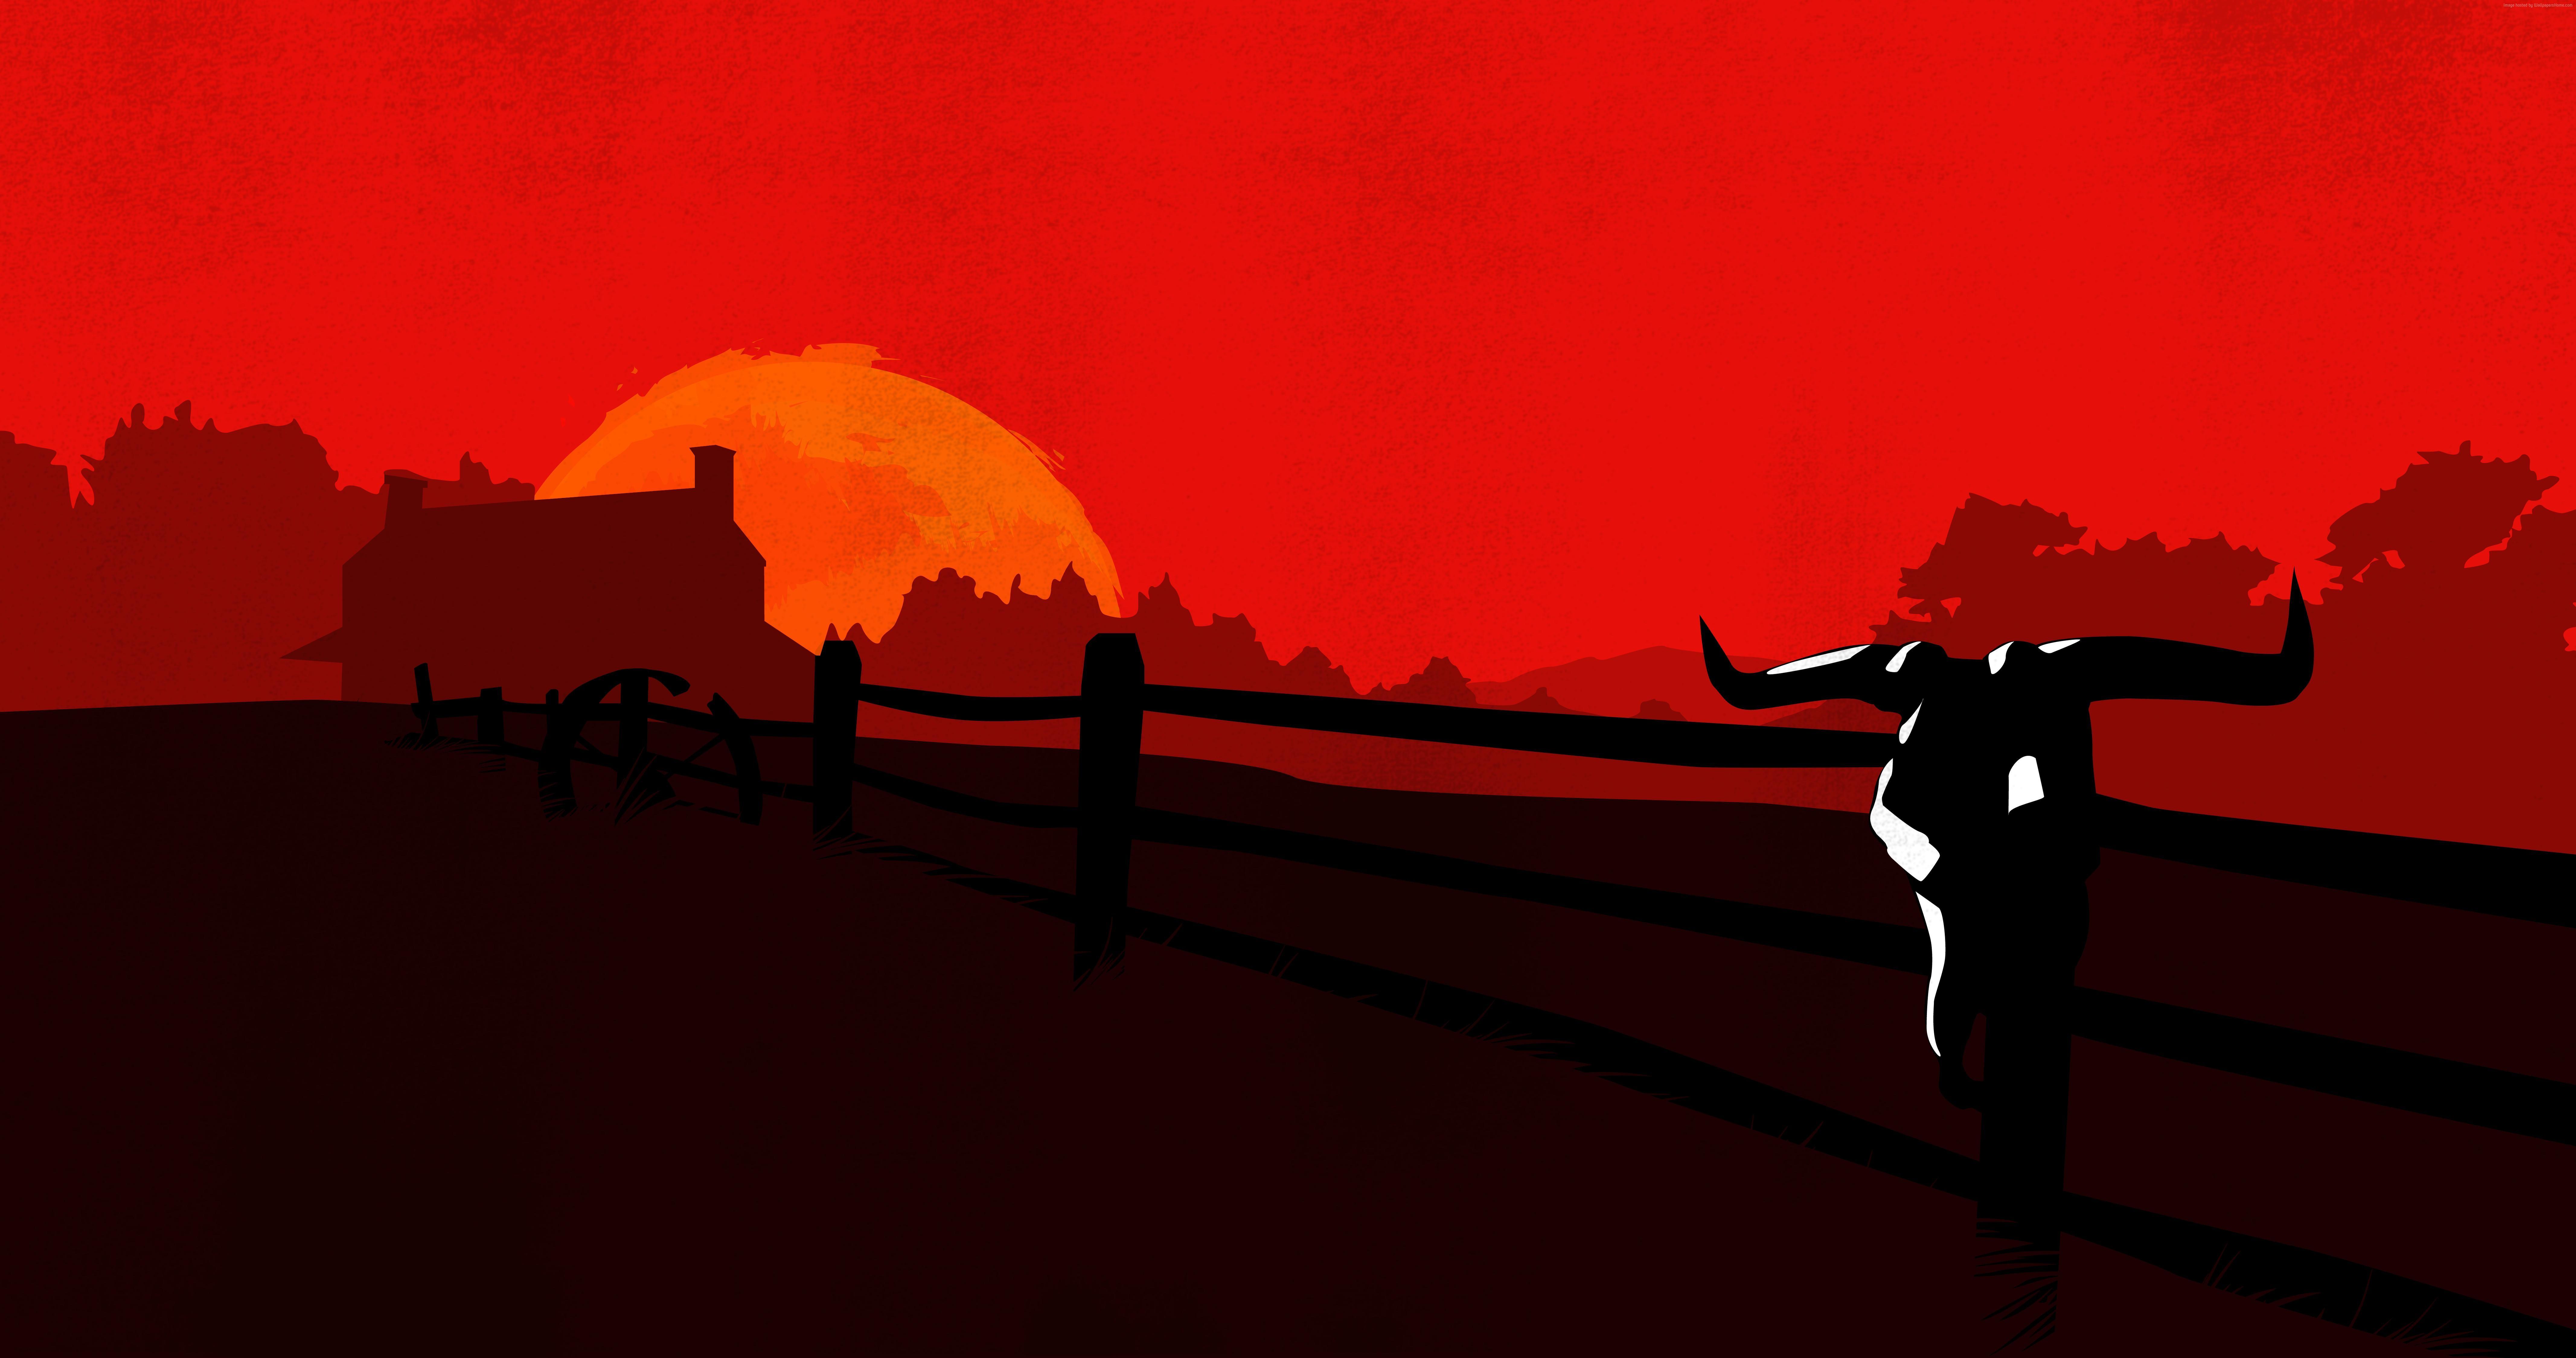 4k wallpaper - Wallpaper Red Dead Redemption 2 4k Celular